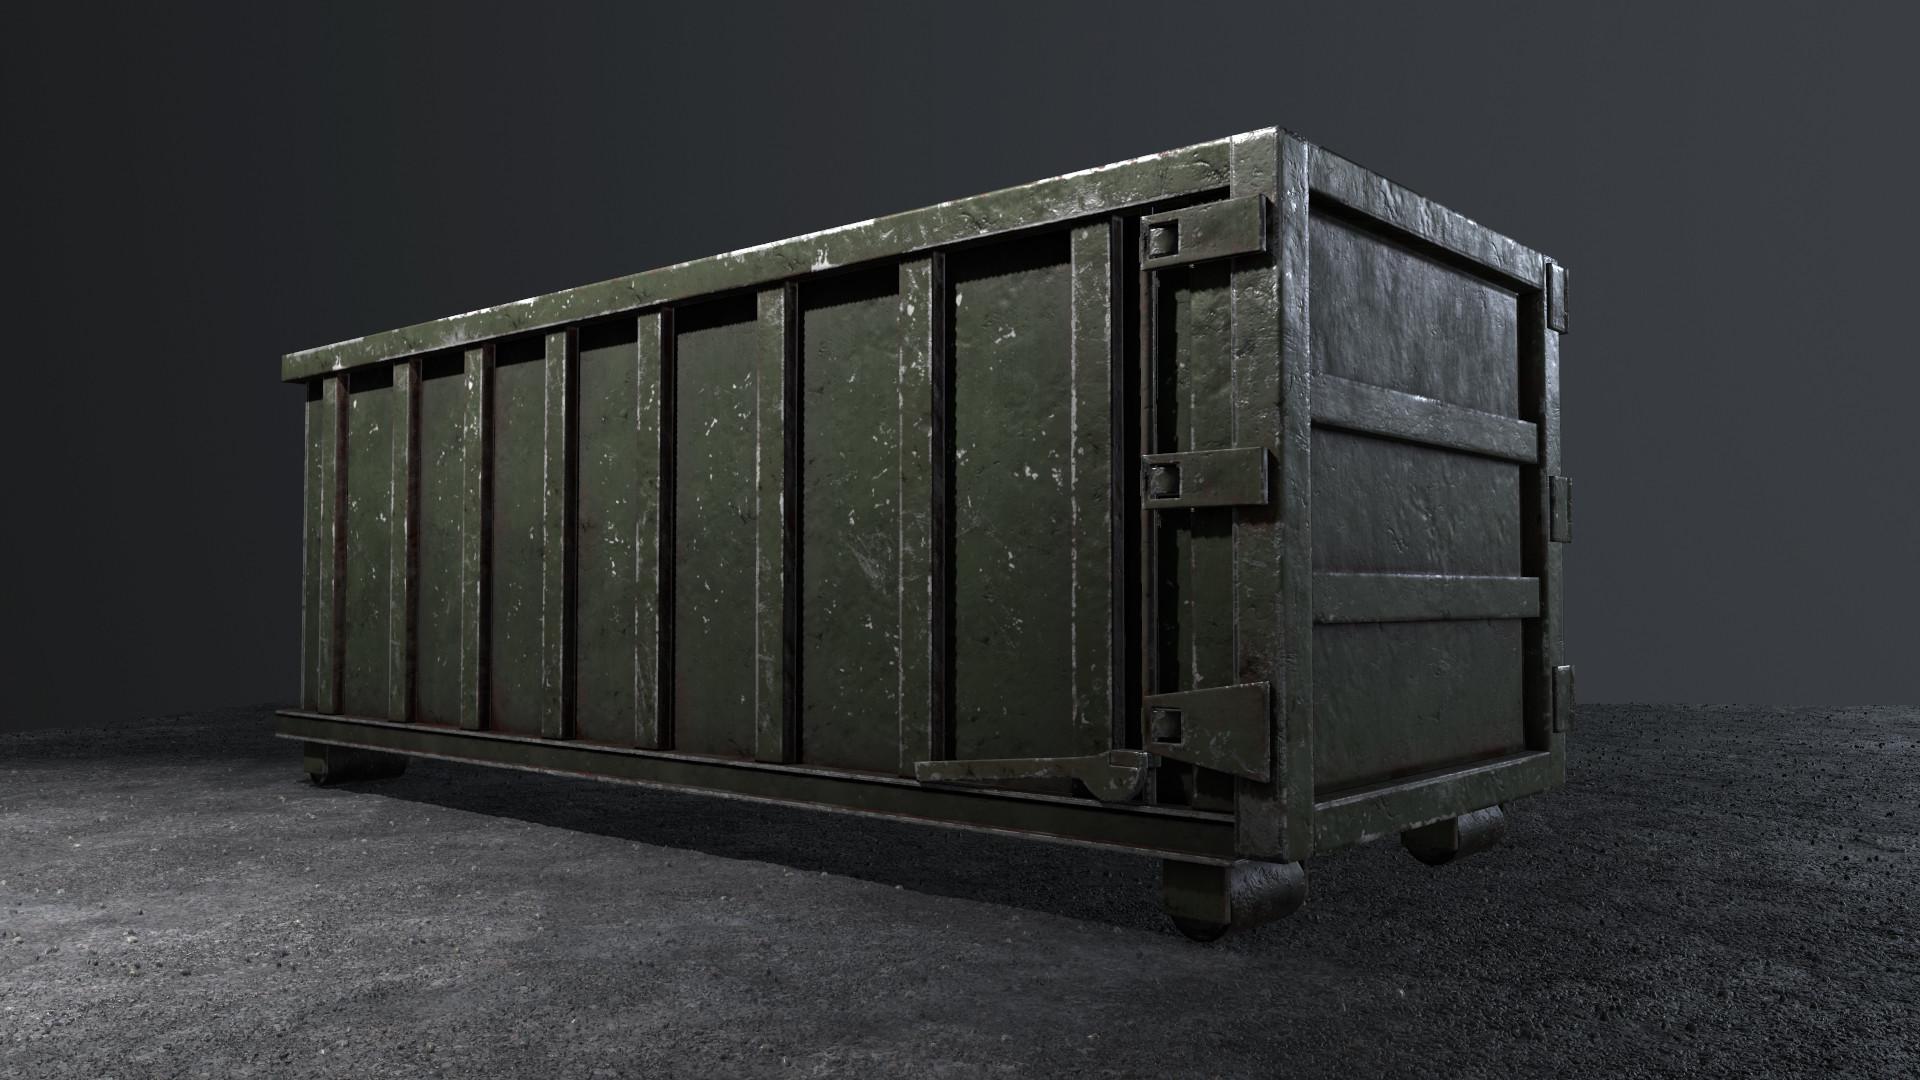 Kurt kupser assets 0004 trash container 2